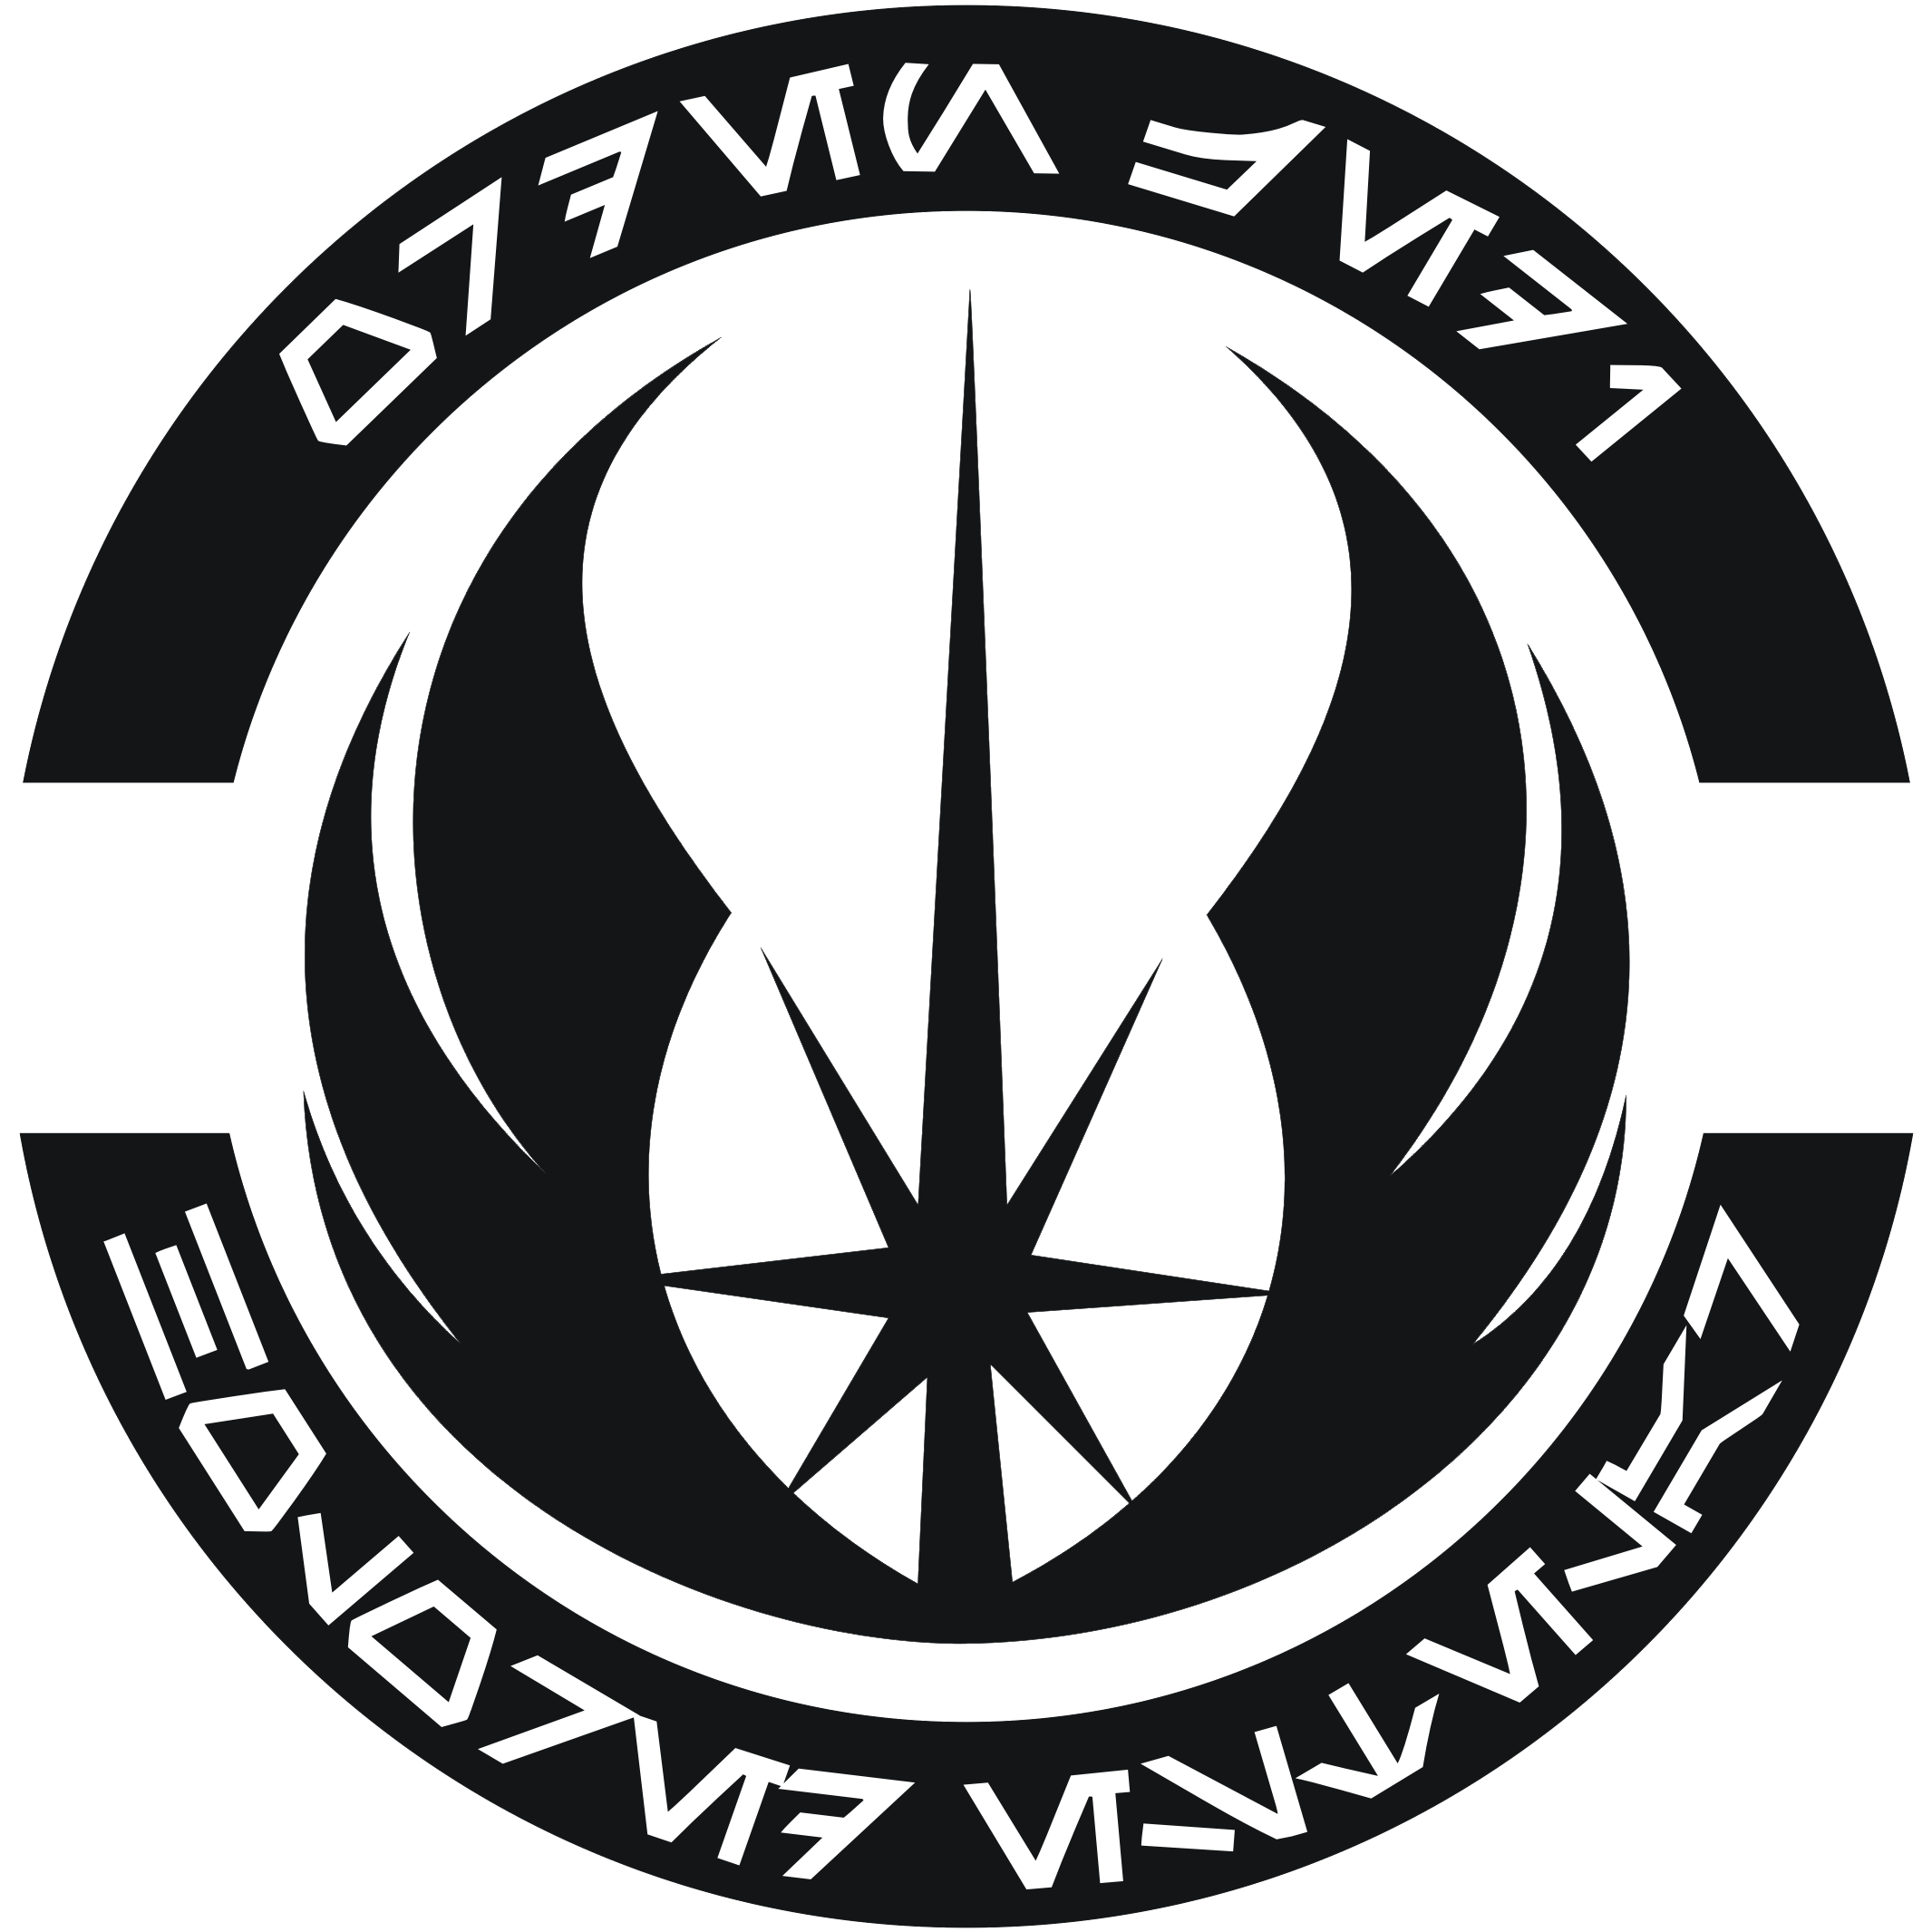 Star wars jedi symbol. Starwars clipart logo